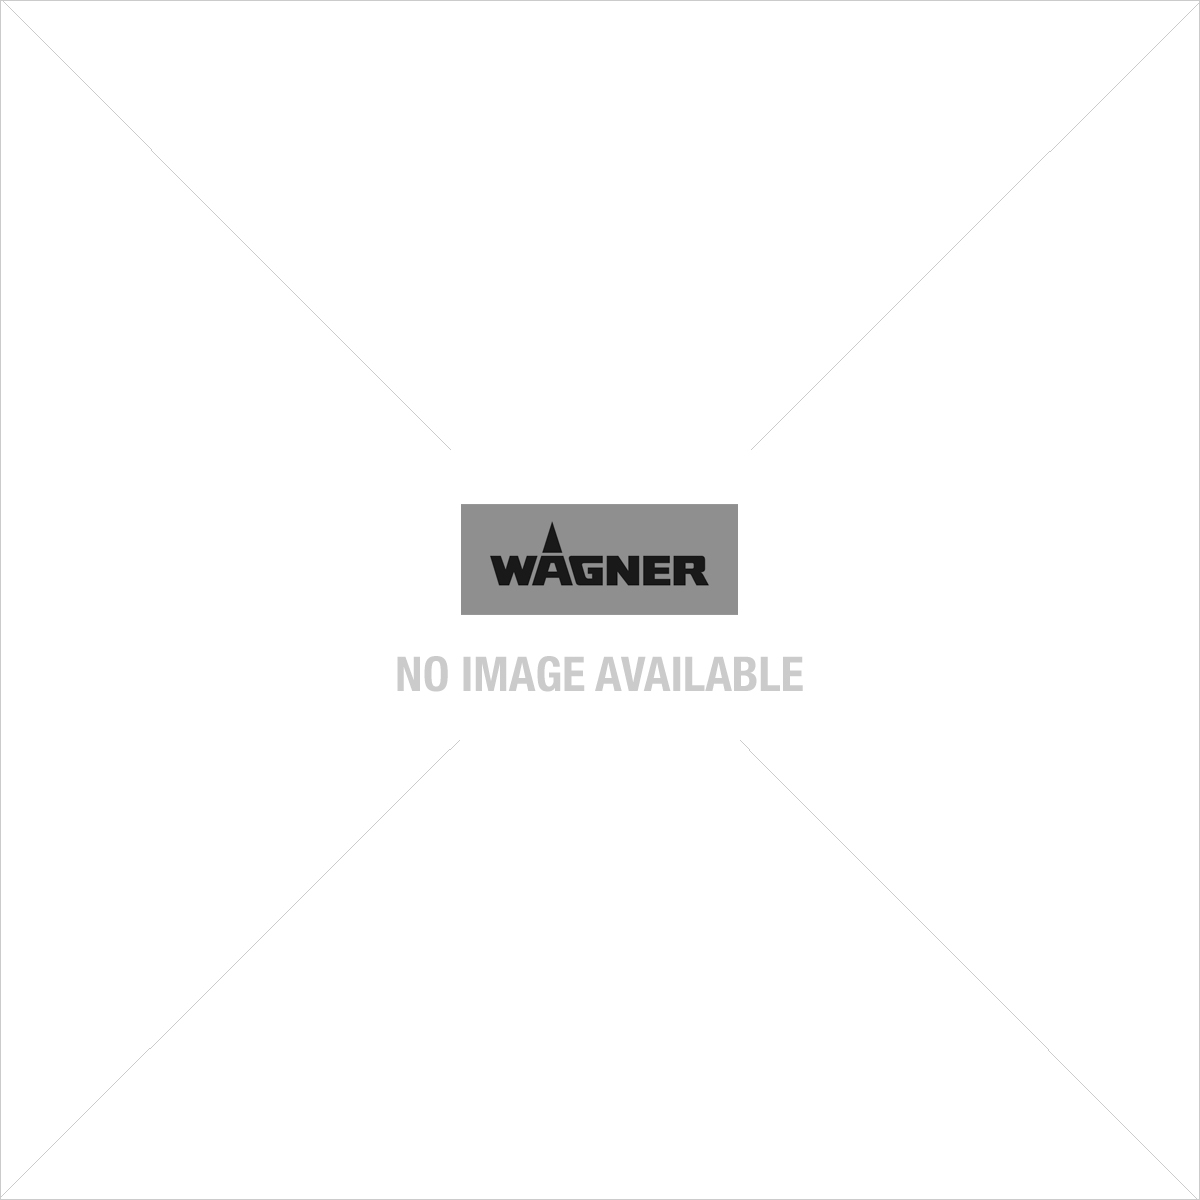 Kit de masquage peinture Wagner petit